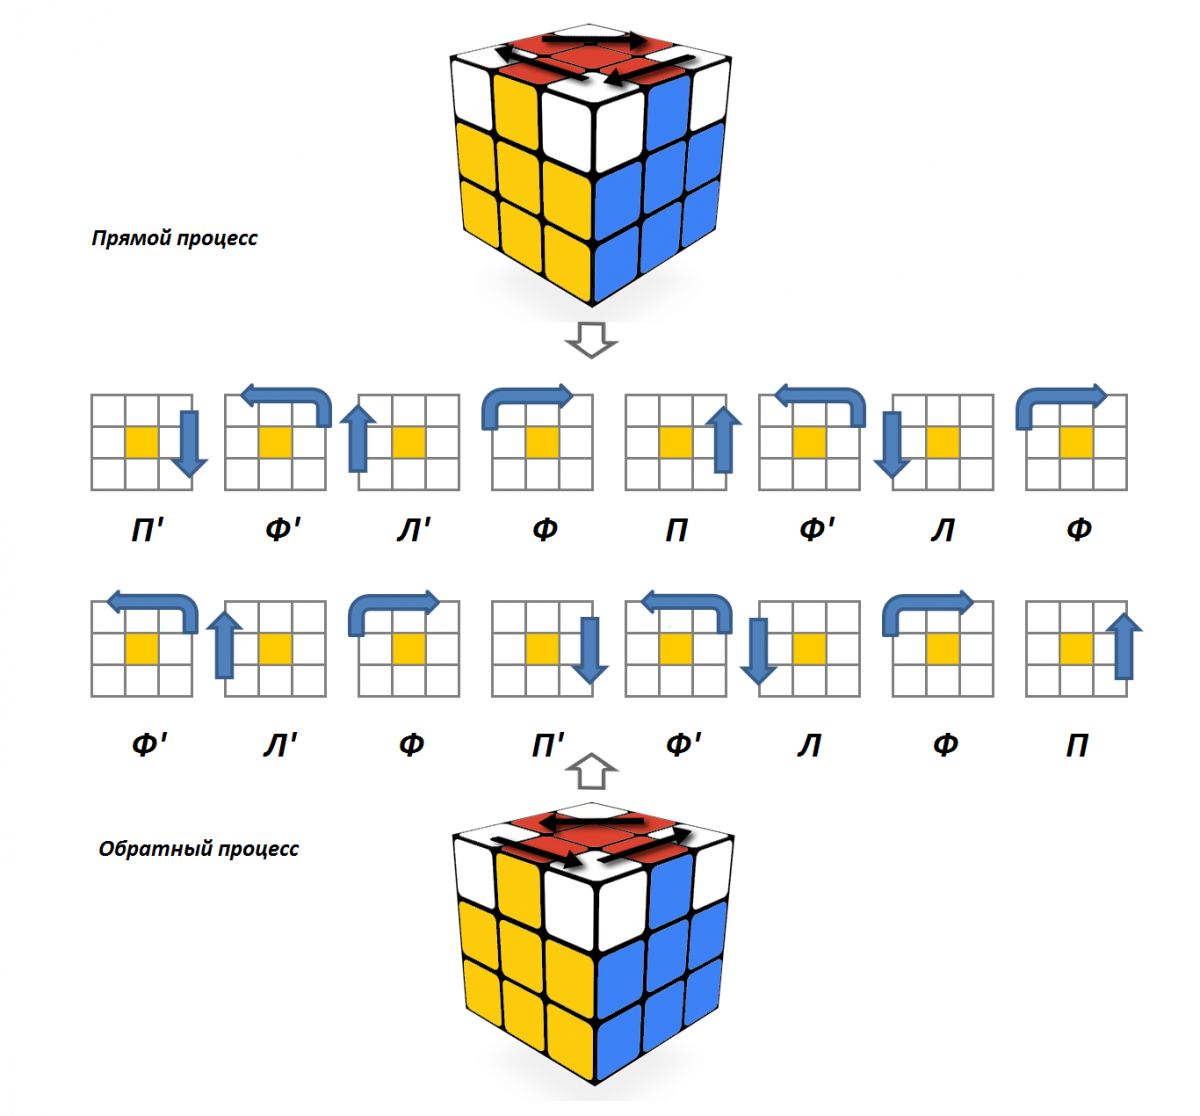 Кубик рубика схема сборки рекорд